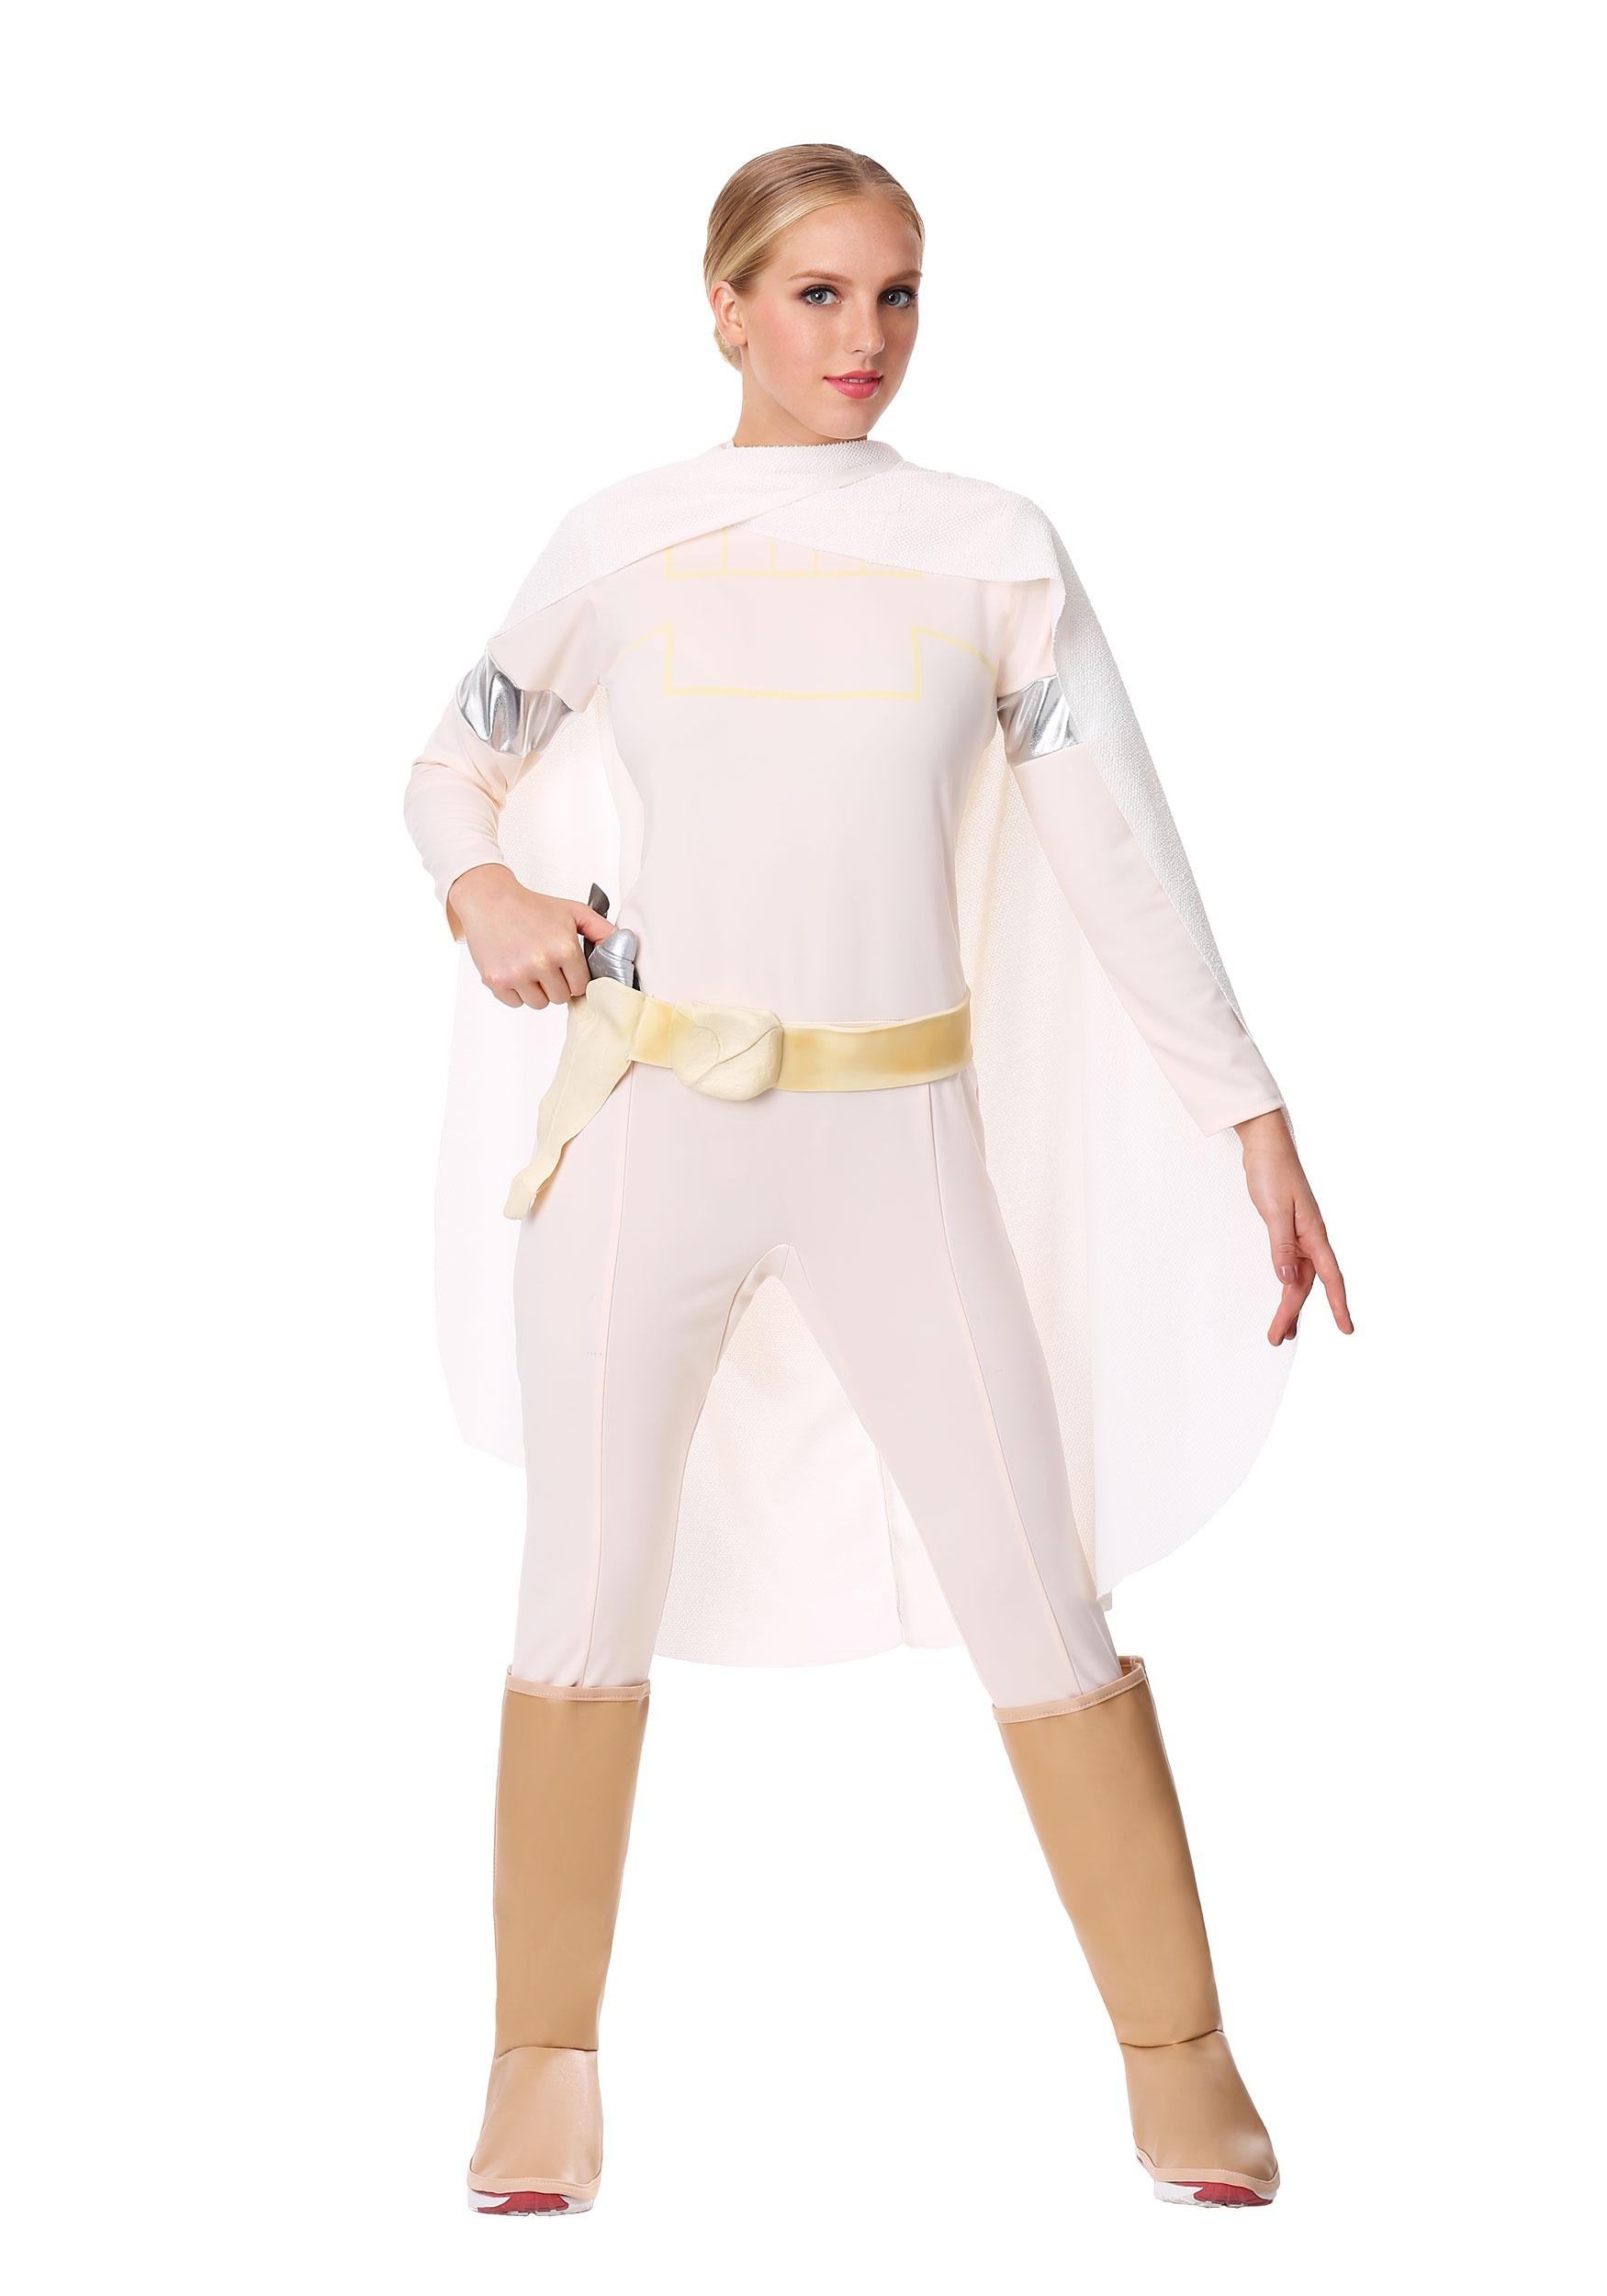 Ultra Padme Amidala Costume